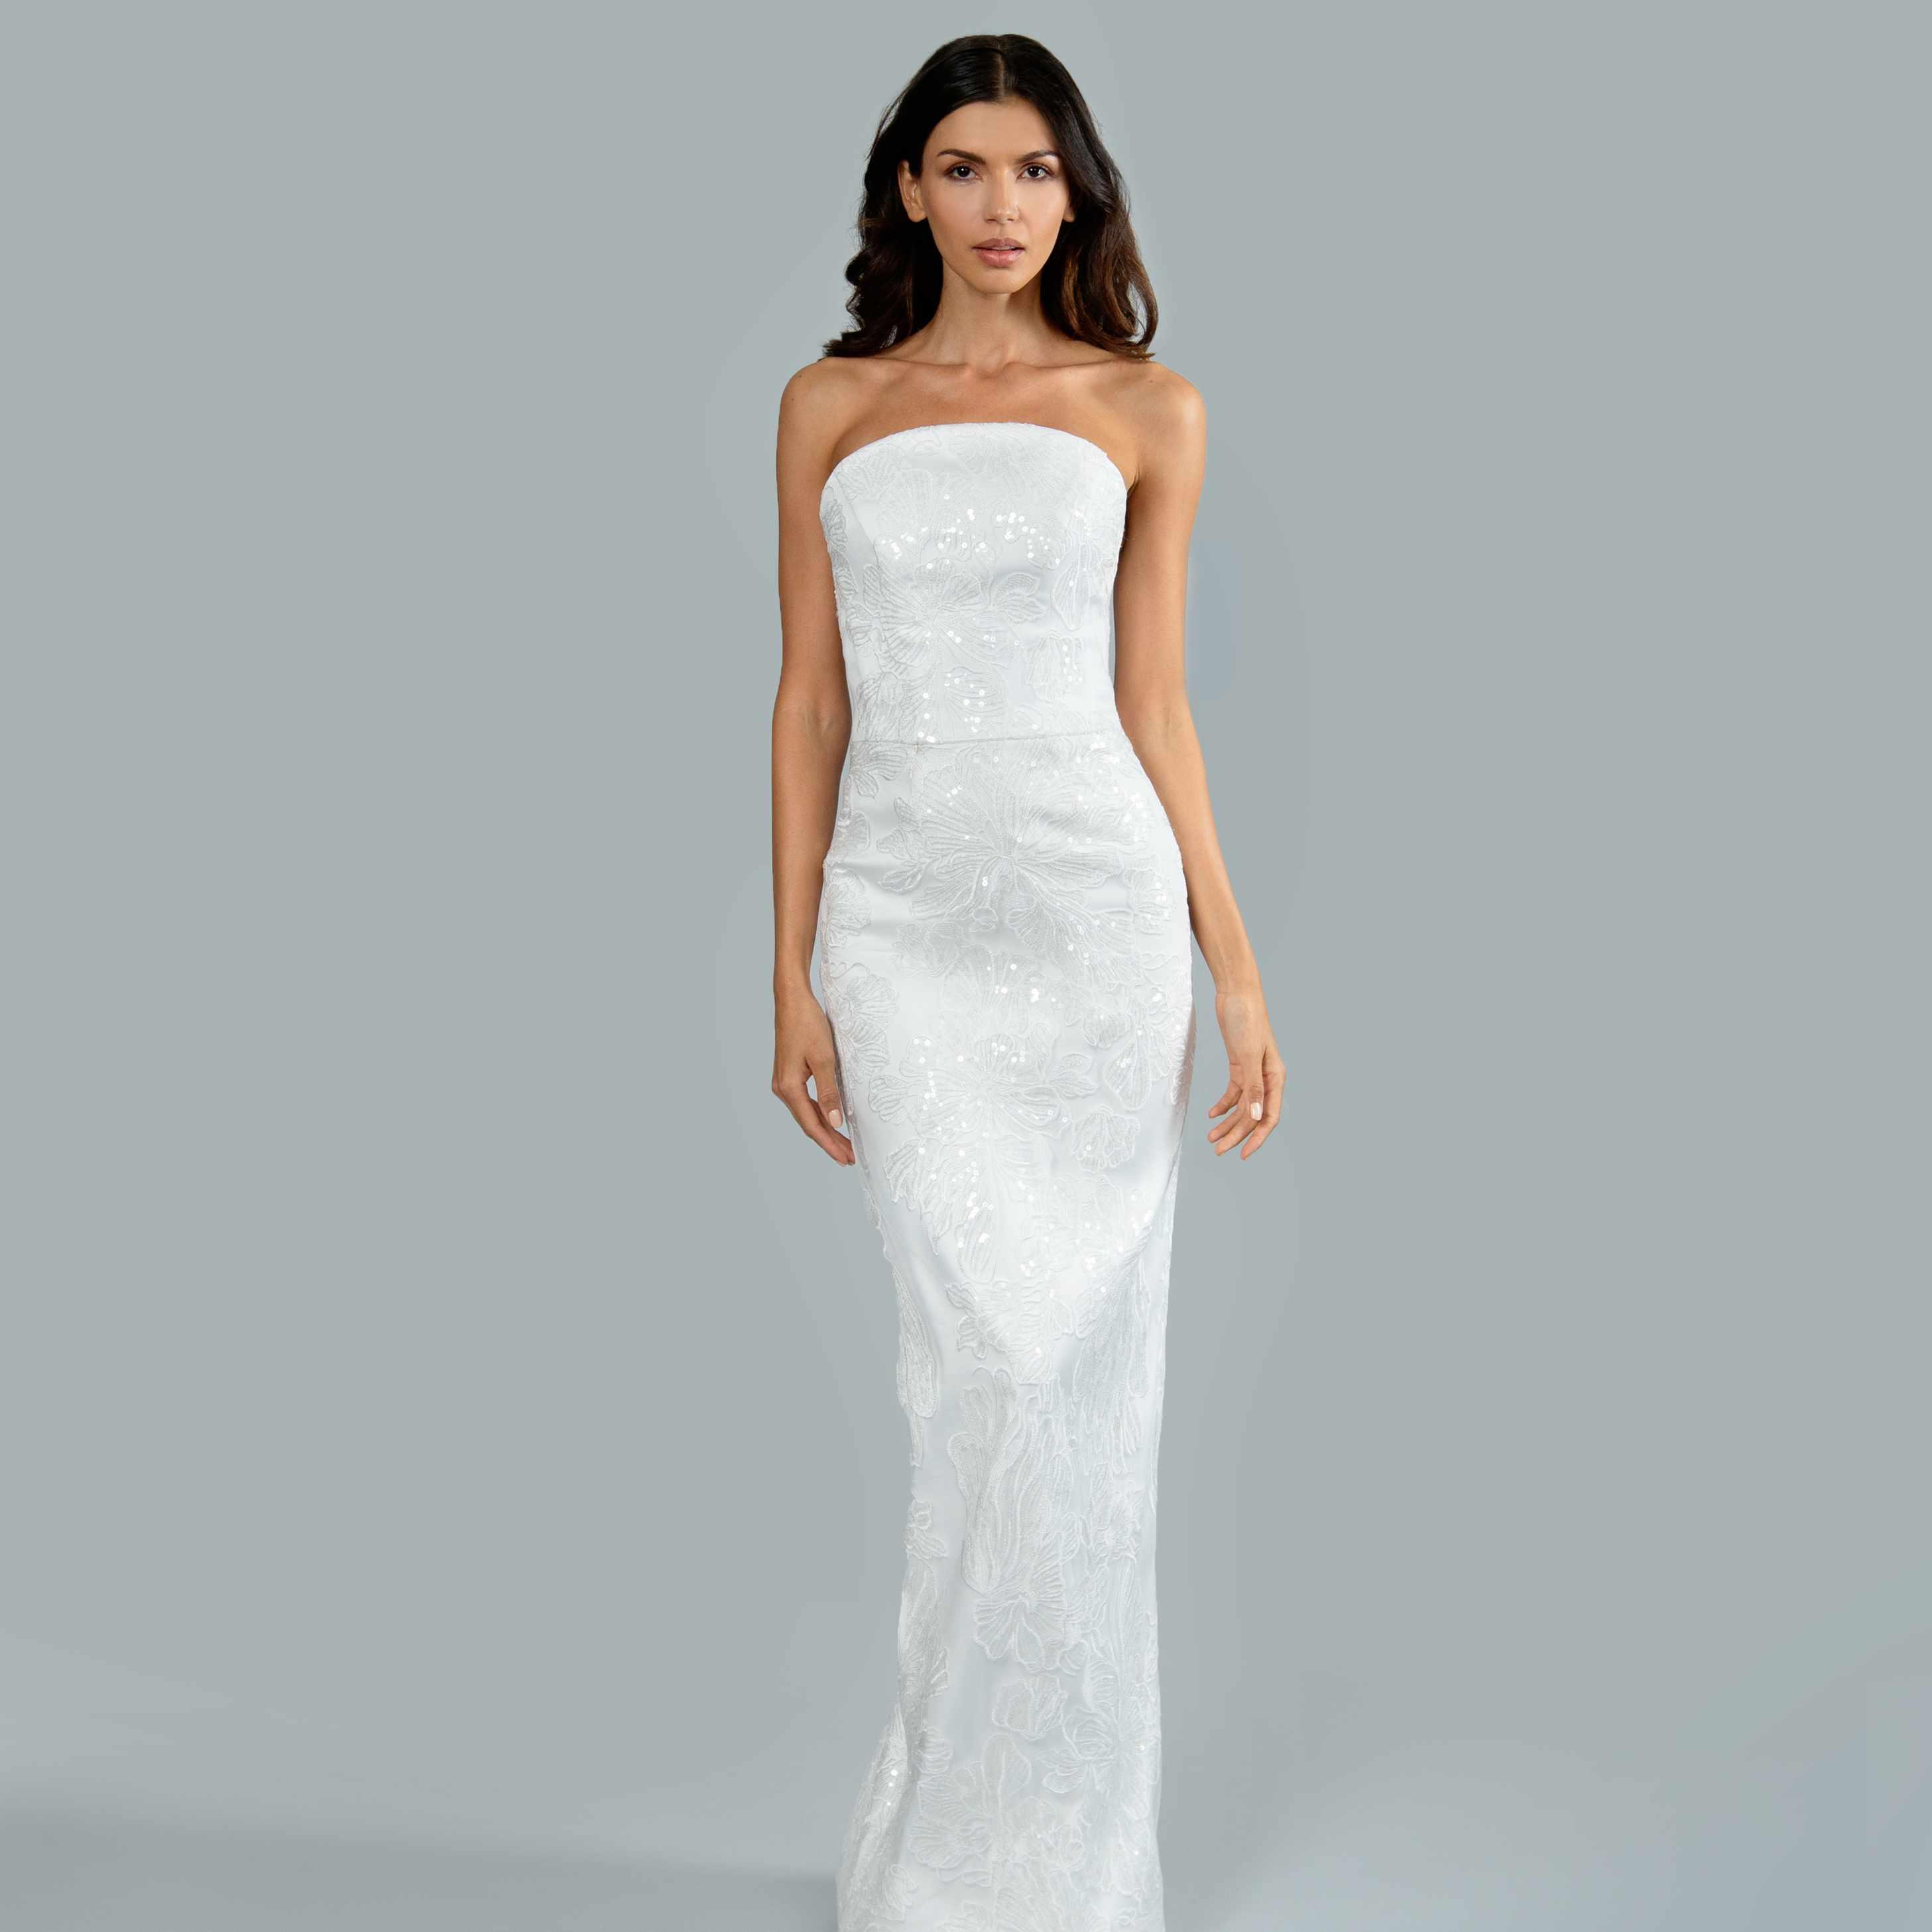 Model in strapless column wedding dress